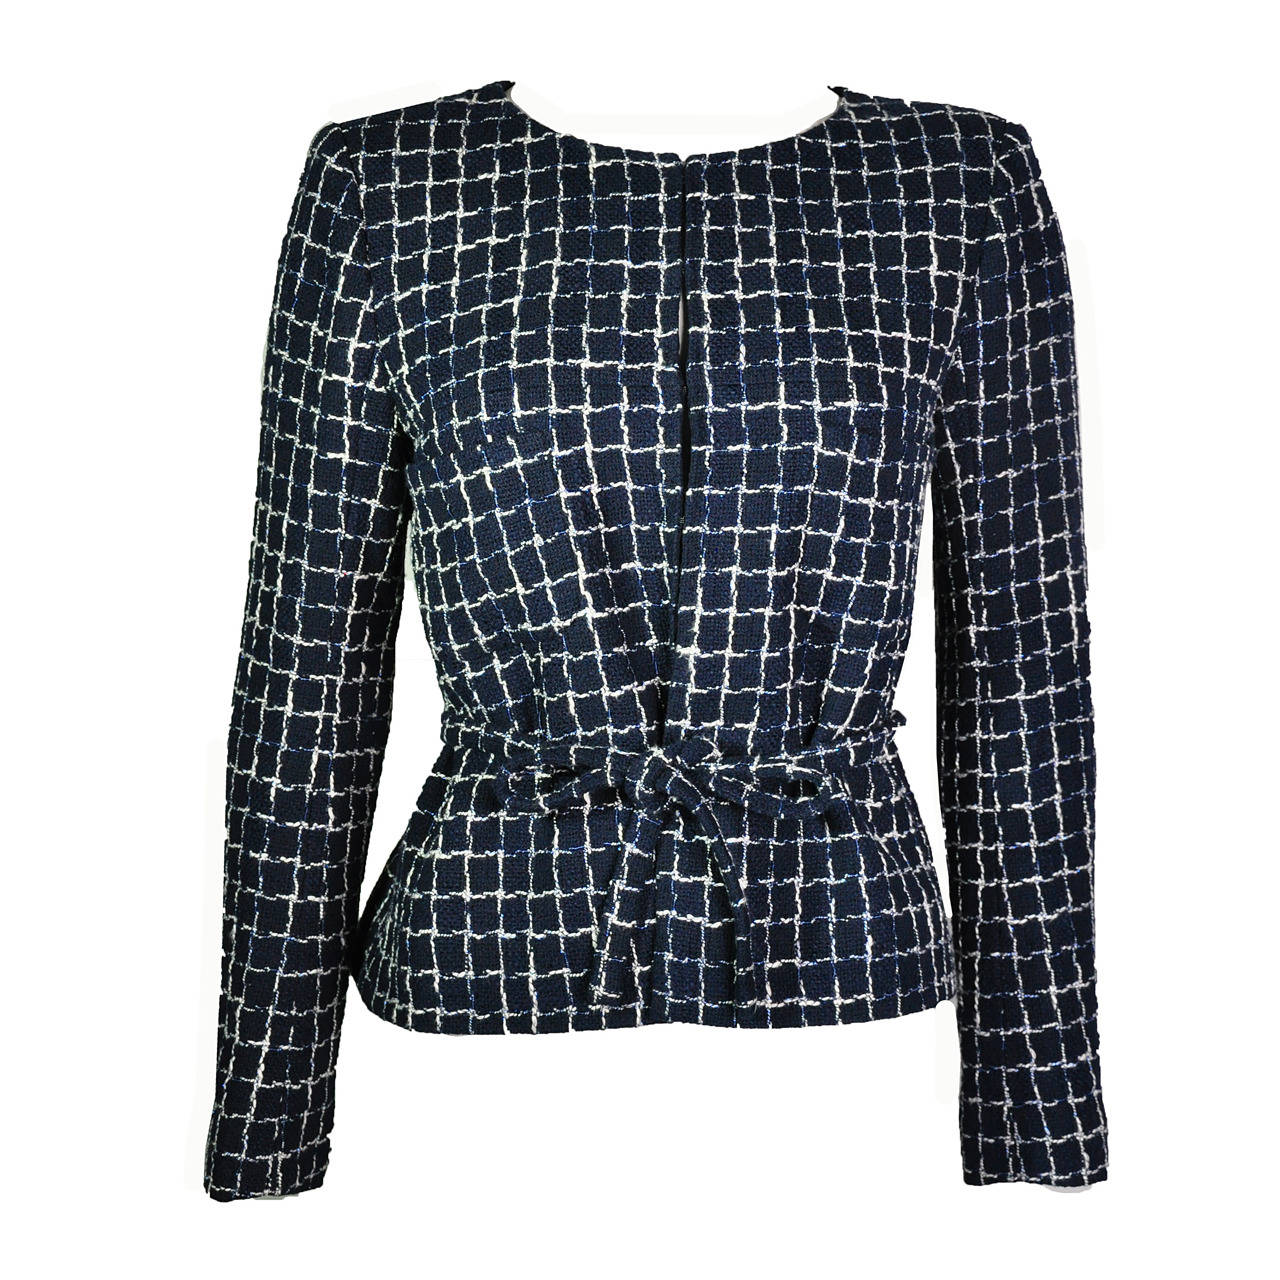 Chanel 2014 S/S Navy Cotton Tweed Jacket FR38 1